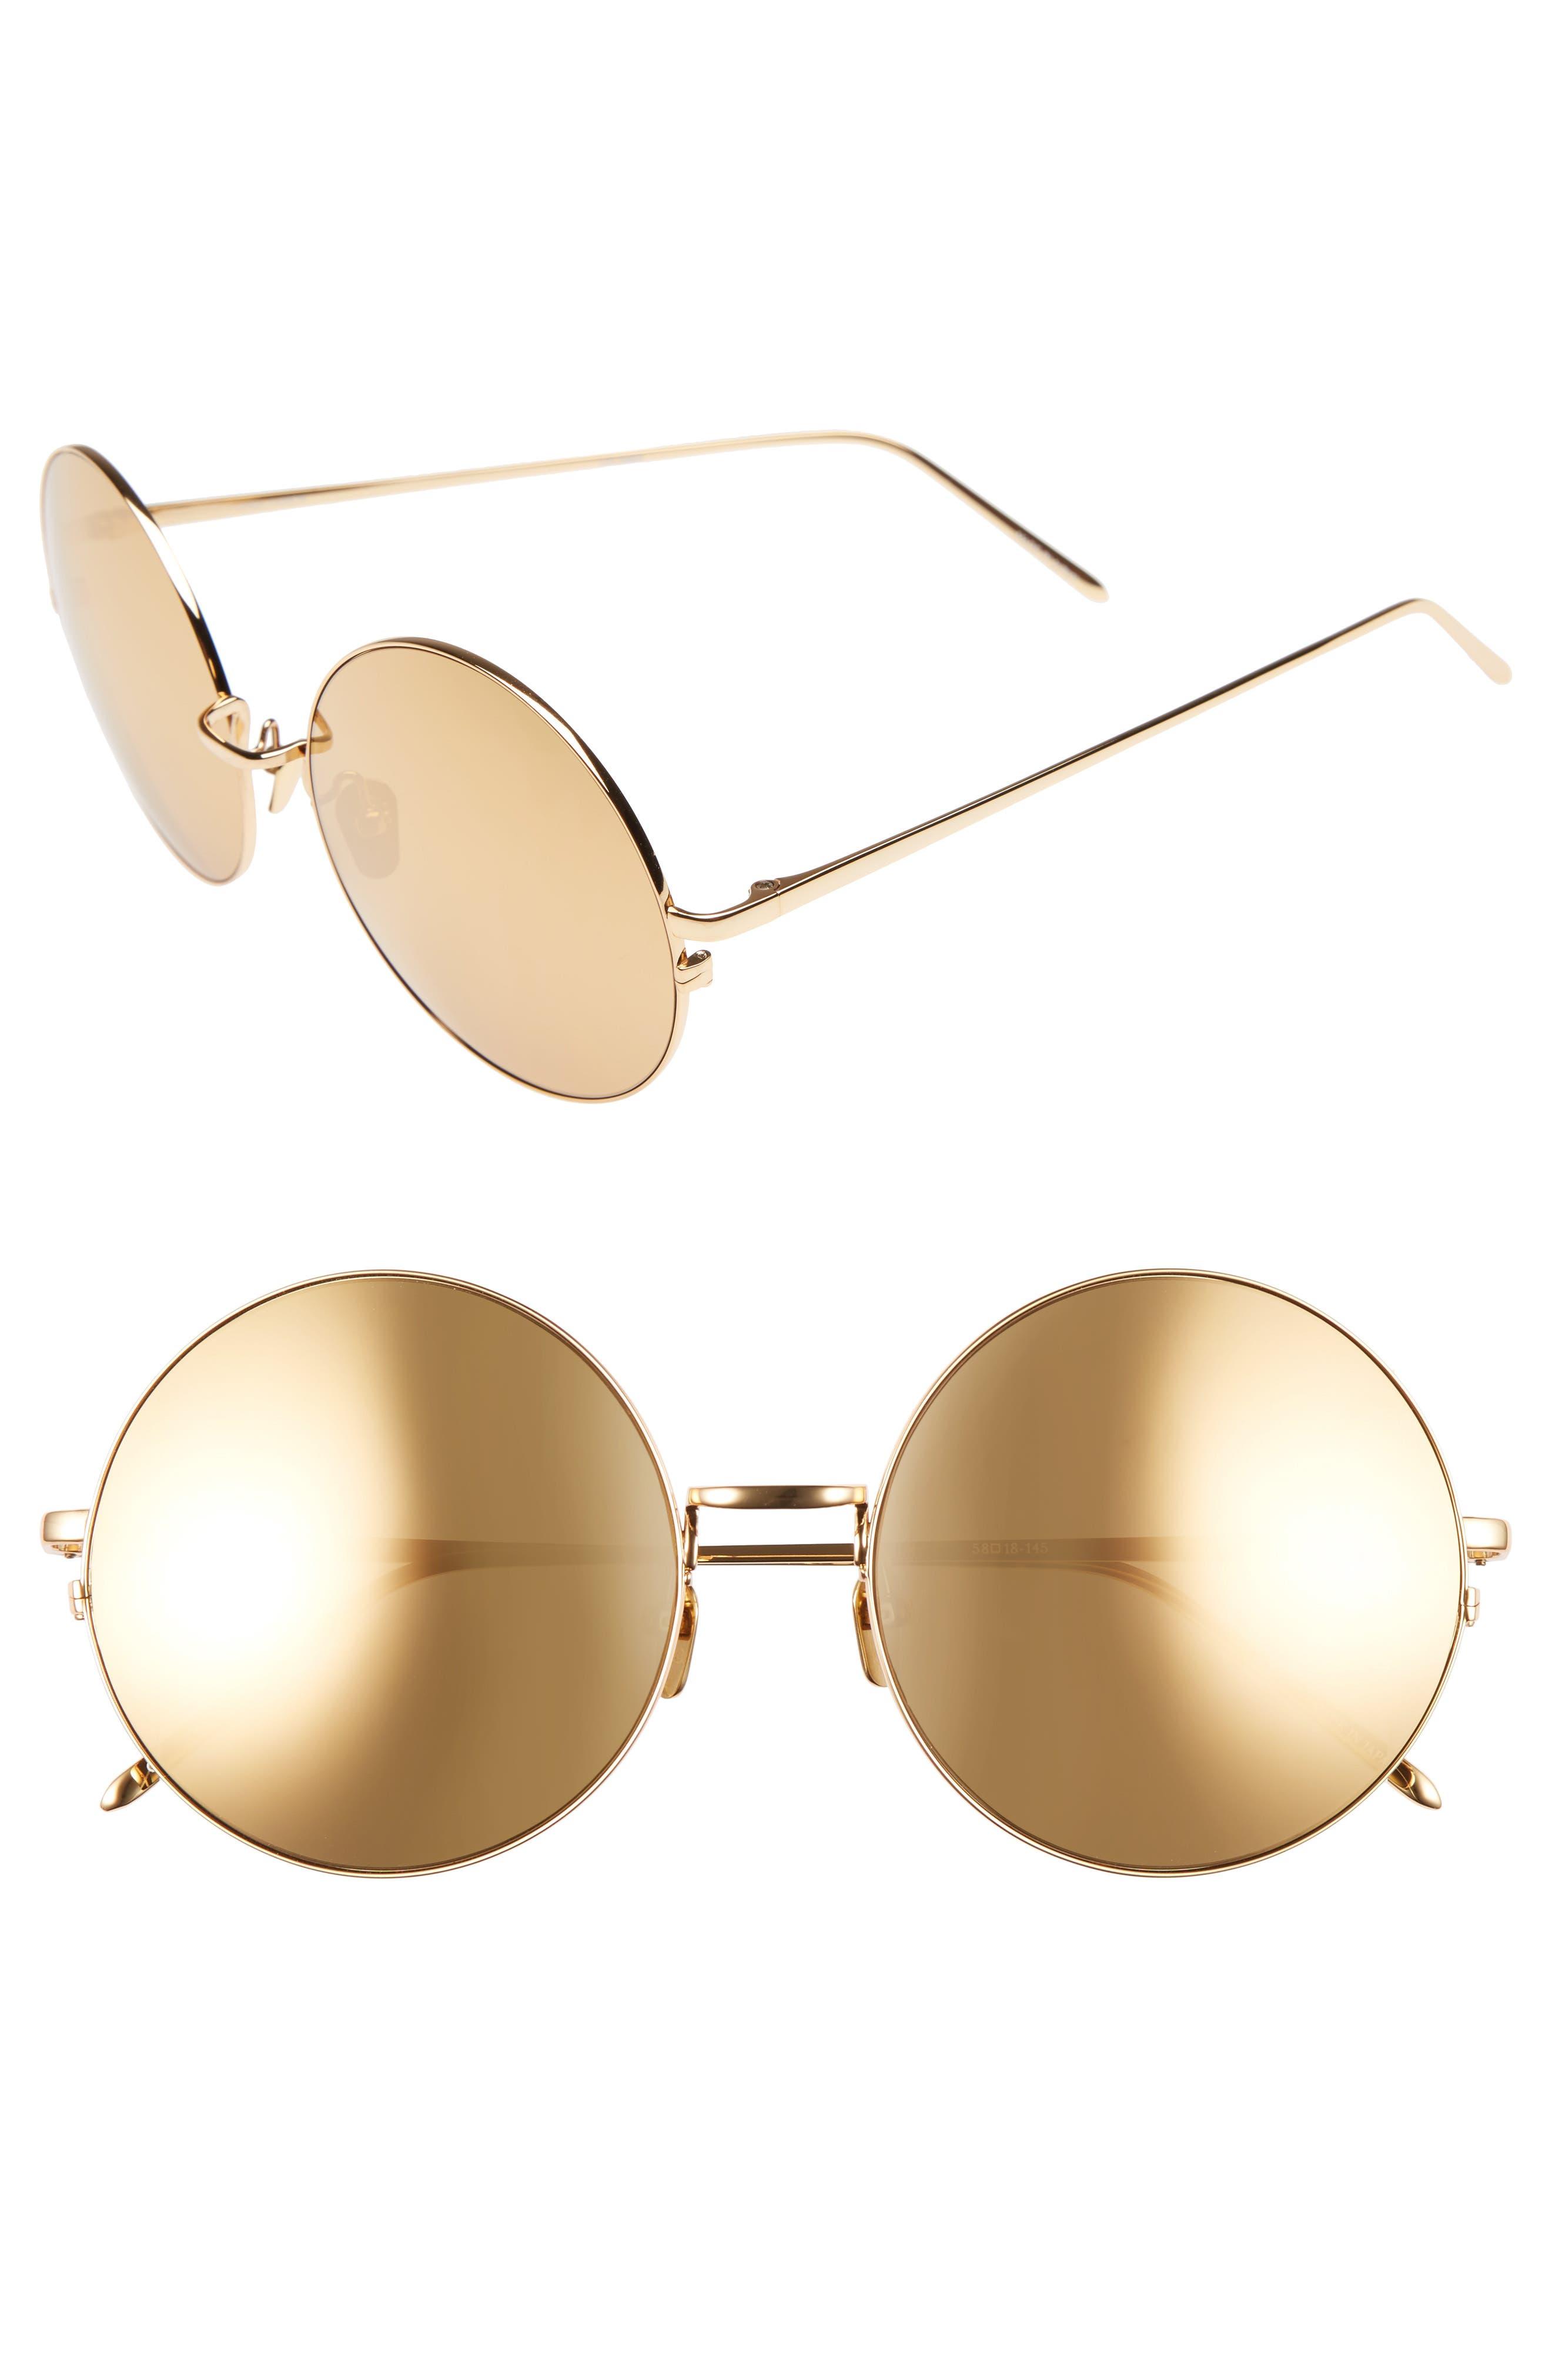 58mm 22 Karat Gold Trim Sunglasses,                             Main thumbnail 1, color,                             Yellow Gold/ Gold